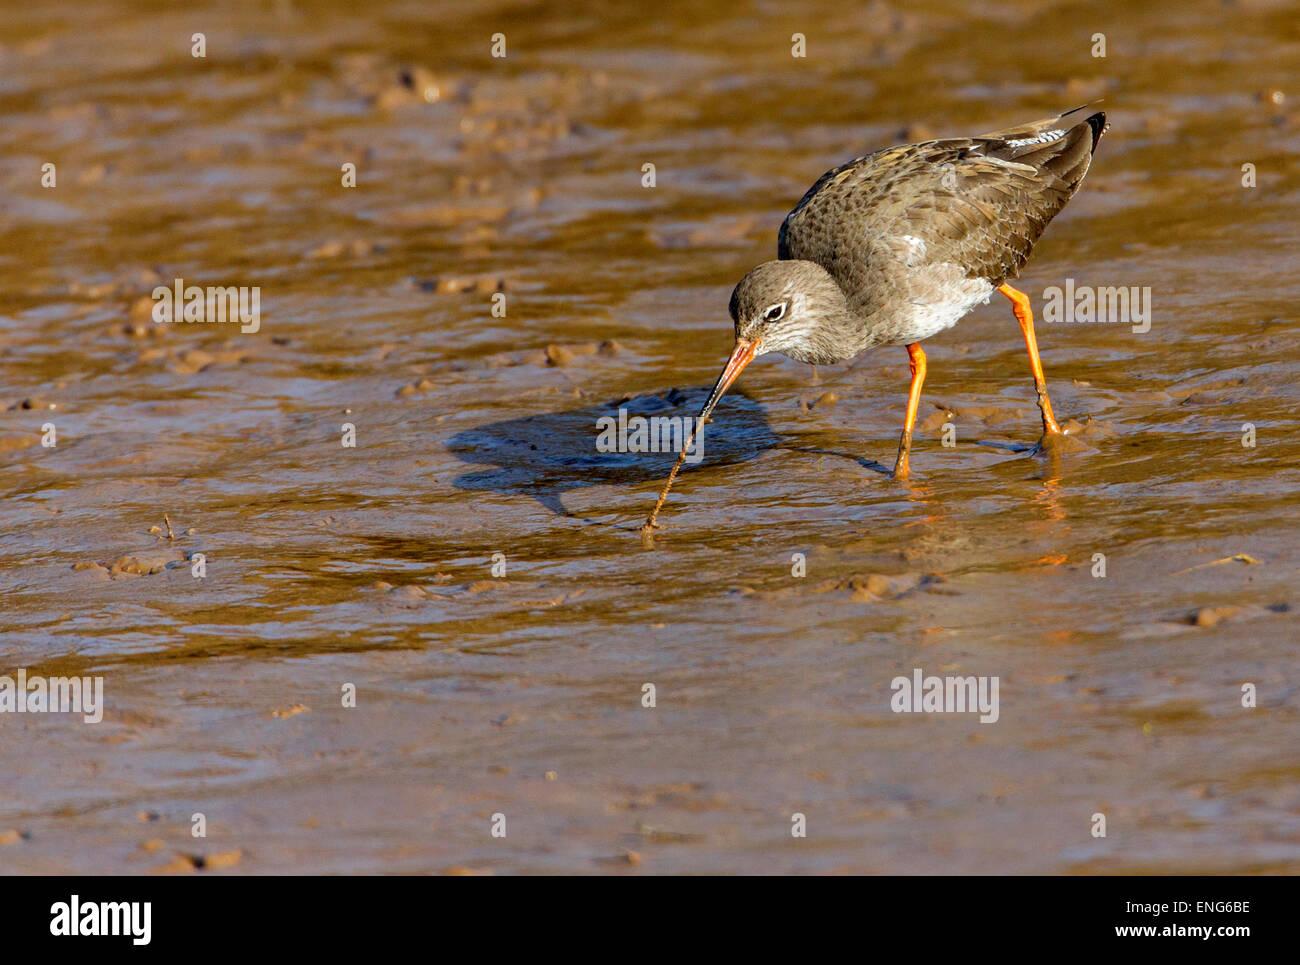 Redshank, (Tringa totanus). Pulling ragworm out of the mud. Chevalier gambette.  Rotschenkel. Archibebe común - Stock Image